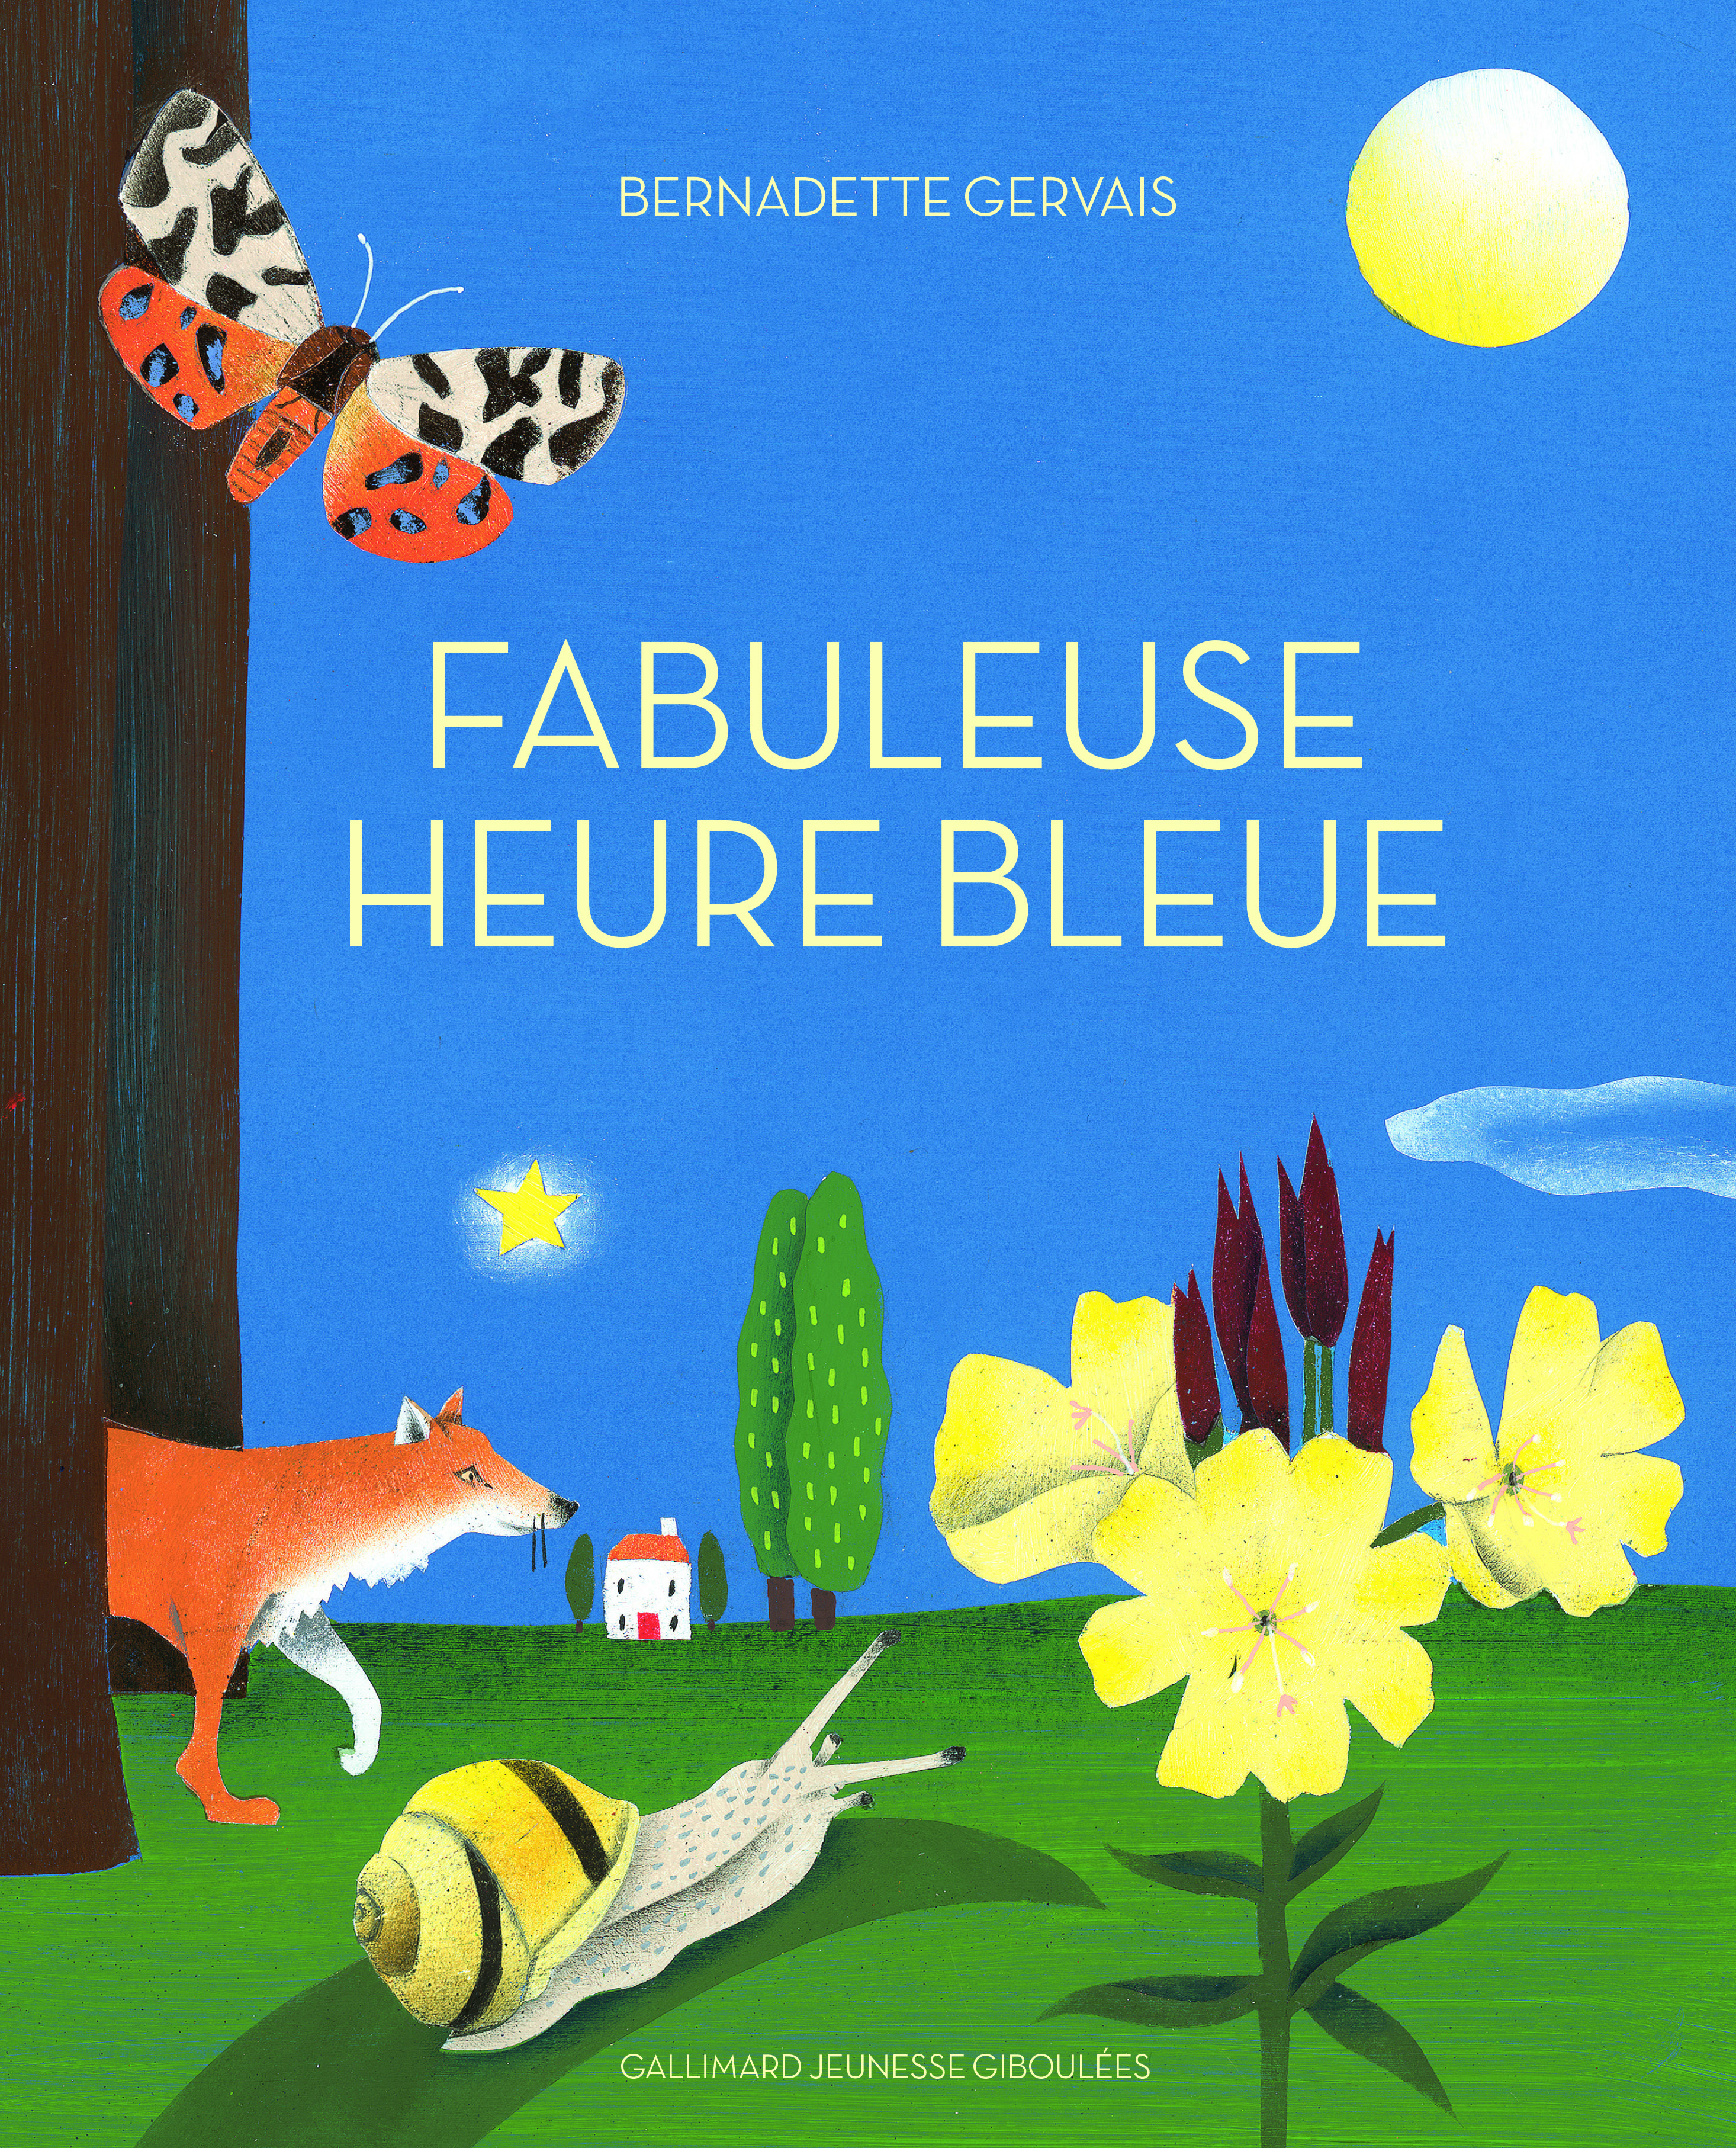 FABULEUSE HEURE BLEUE